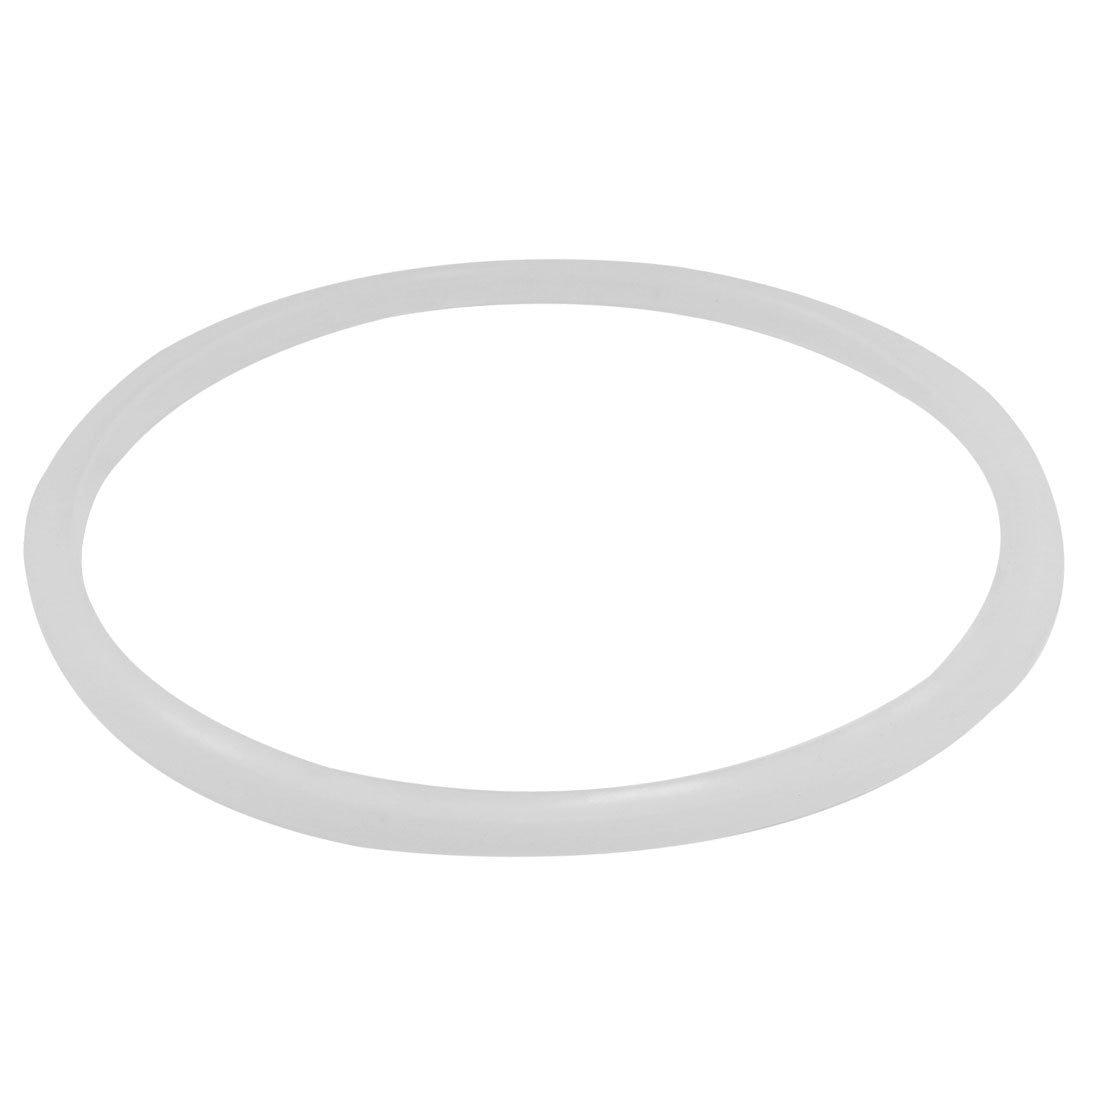 Assortment Black Inc Danco 10711 Small O-Ring